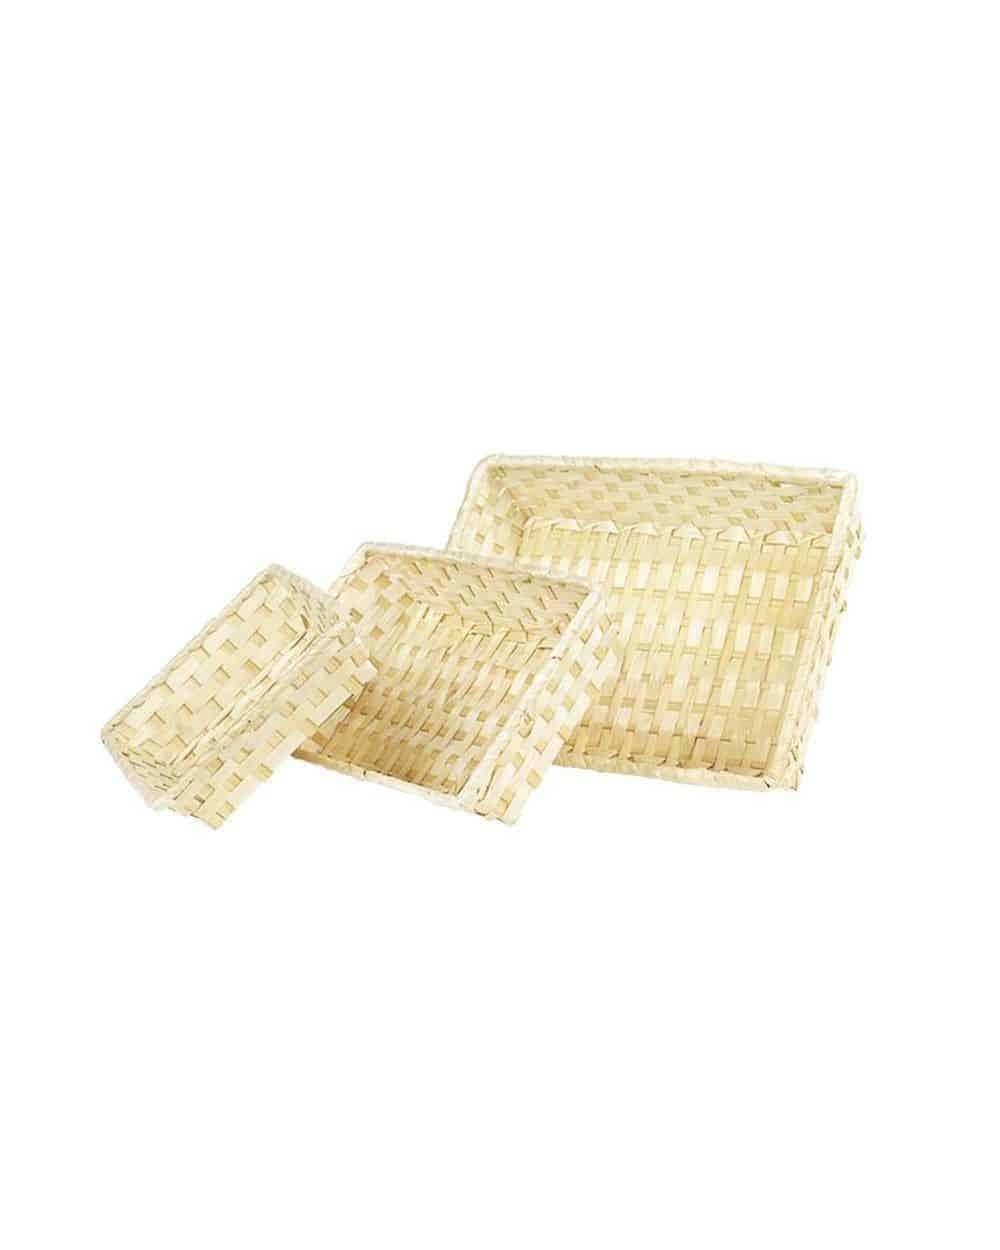 Corbeille bambou rectangle en osier beige GM